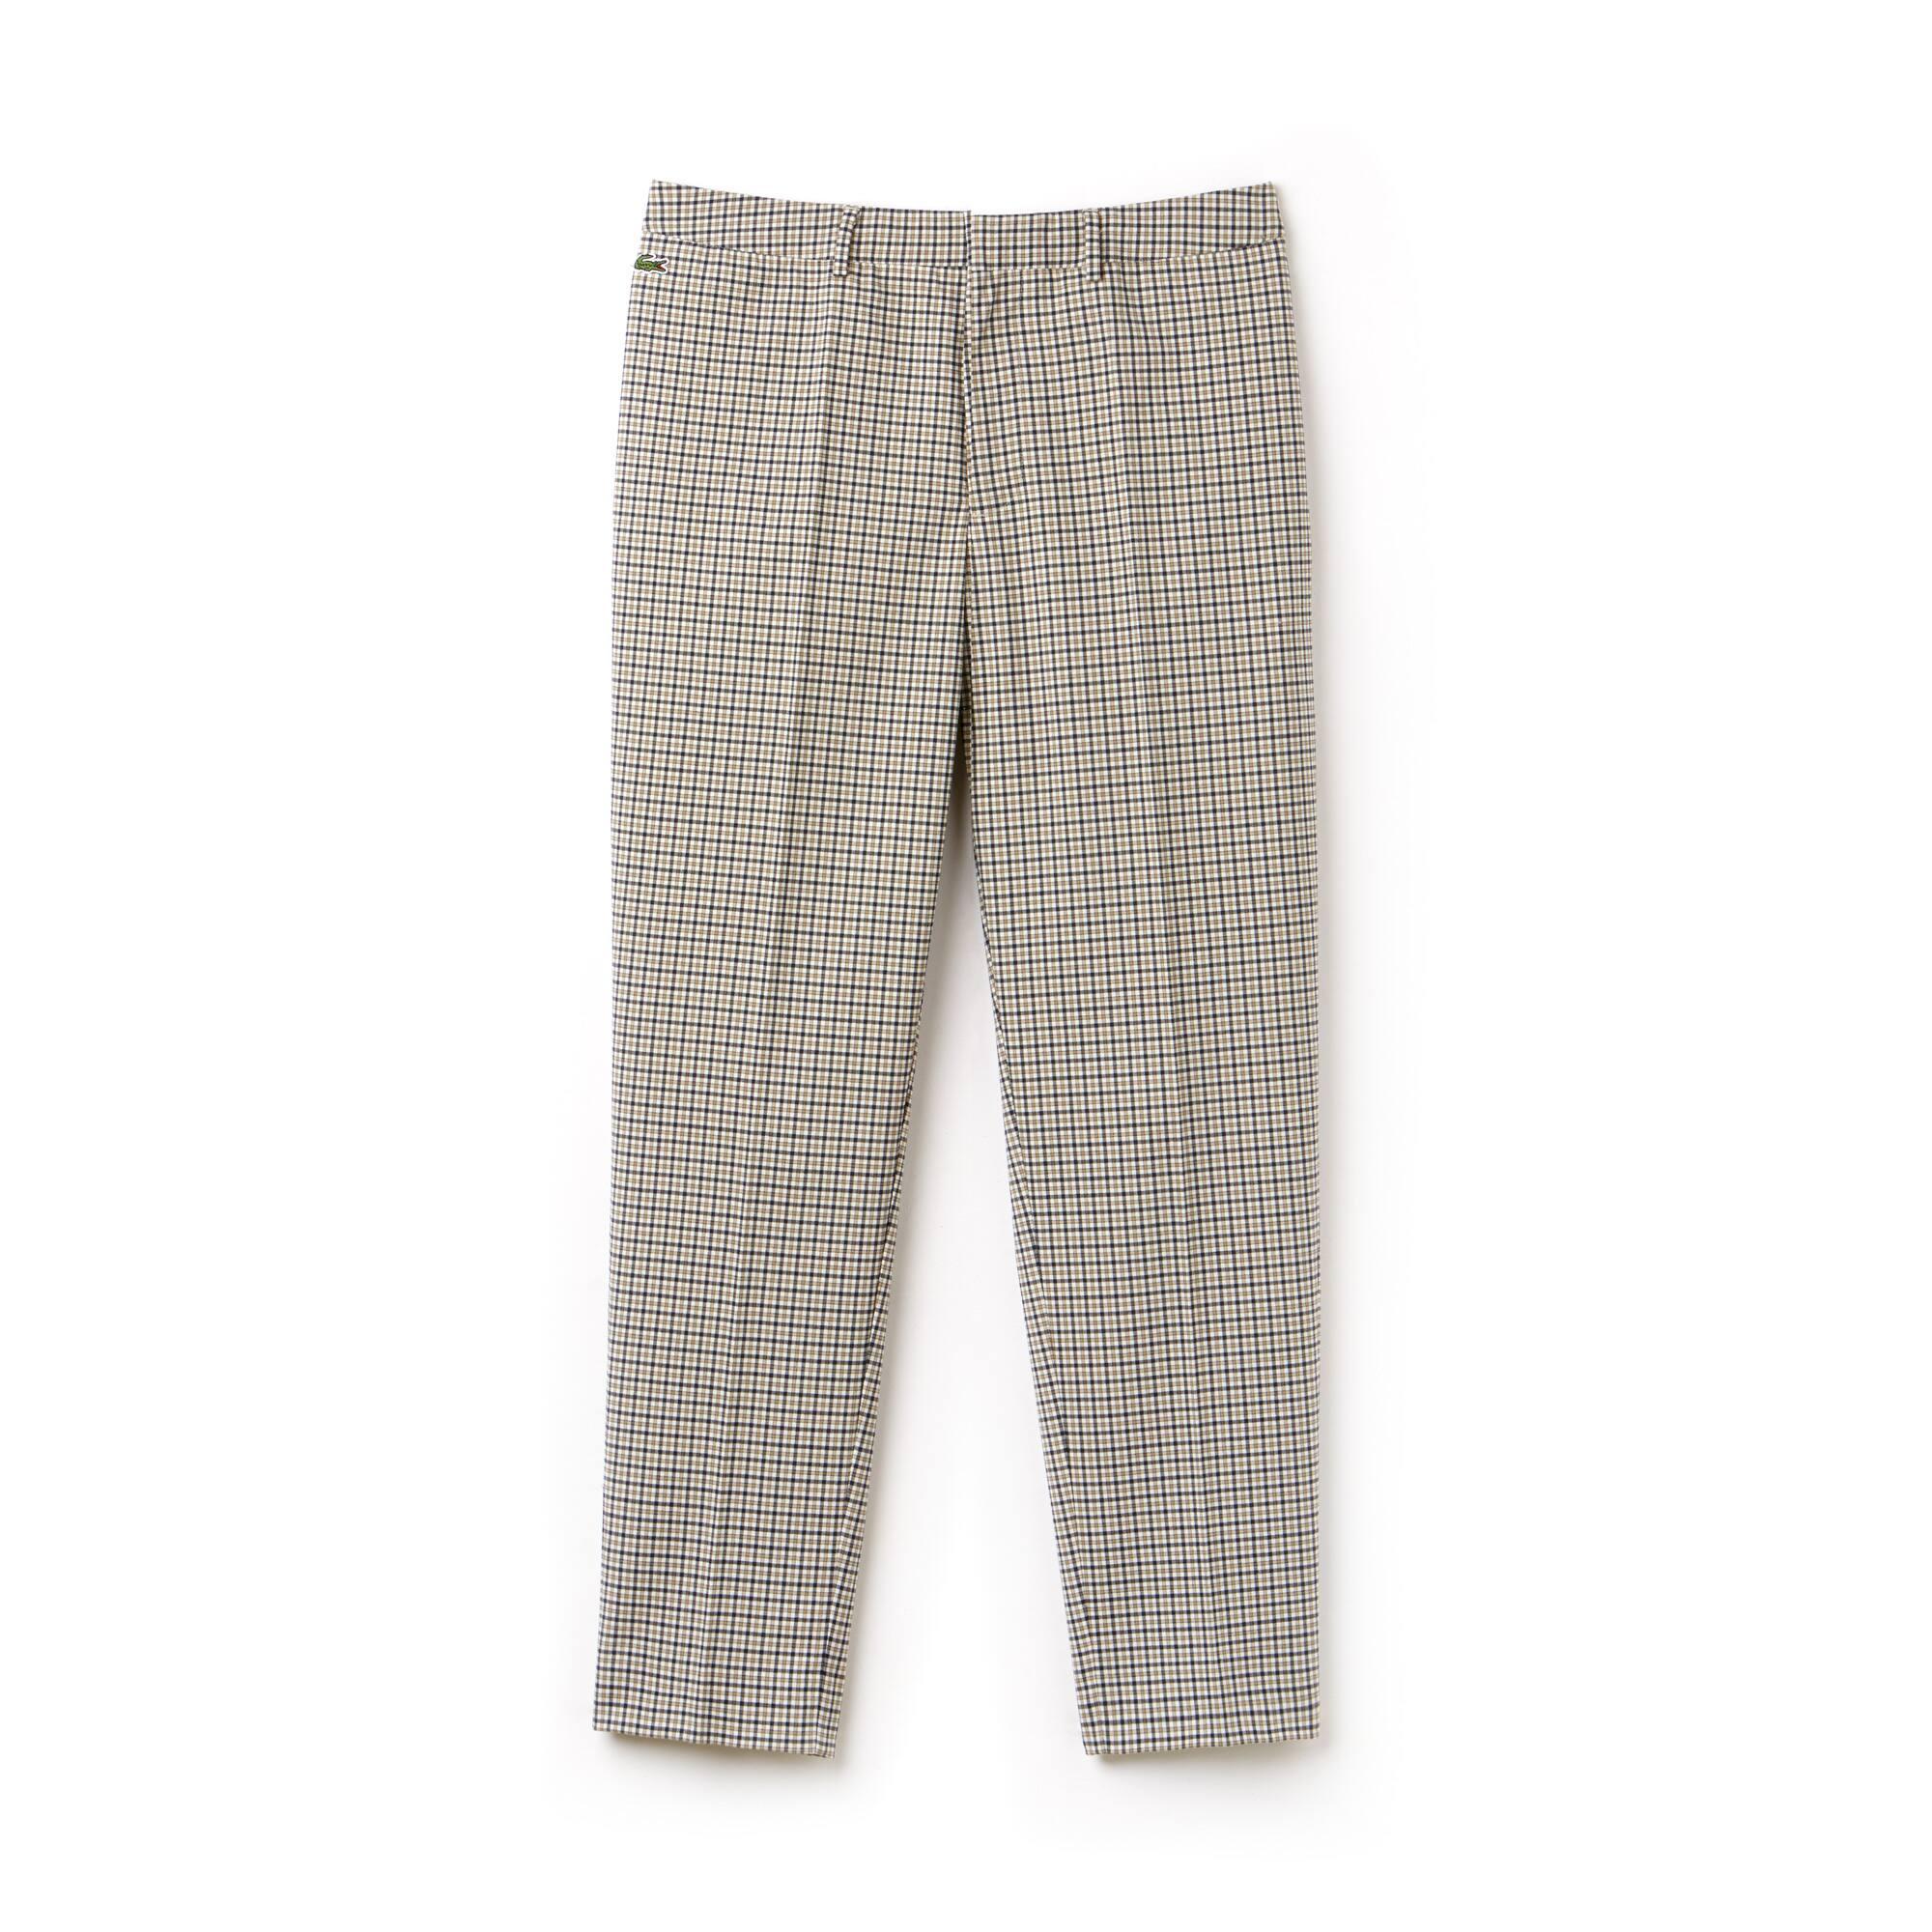 Pantalon chino Lacoste LIVE en twill stretch à carreaux